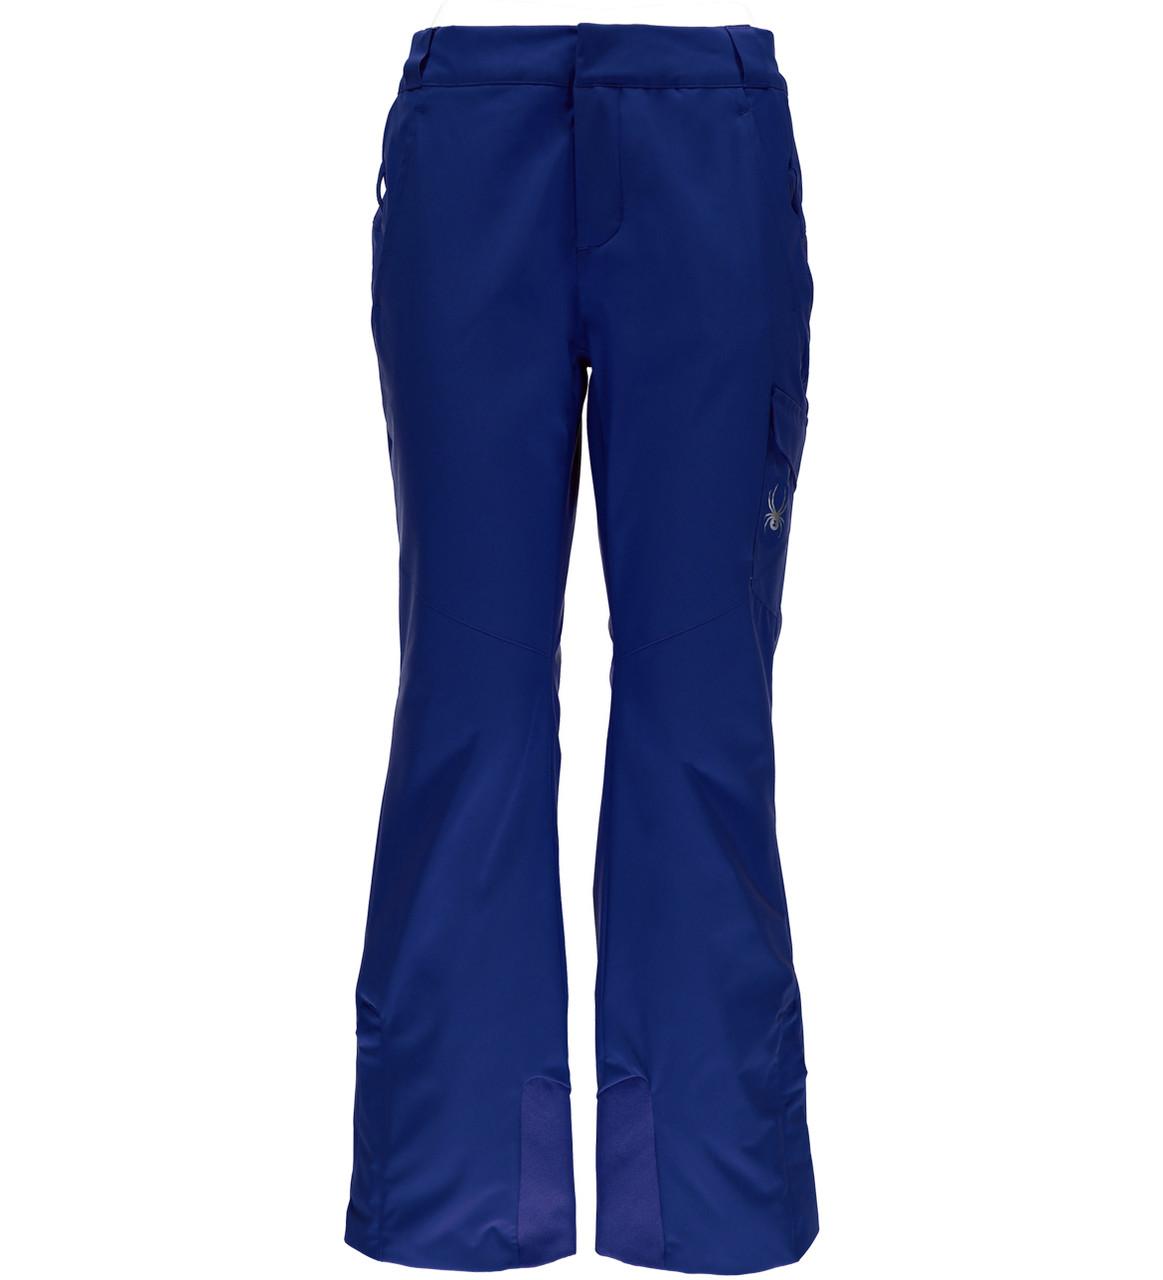 Горнолыжные брюки женские Spyder W me tailored fit black (MD)